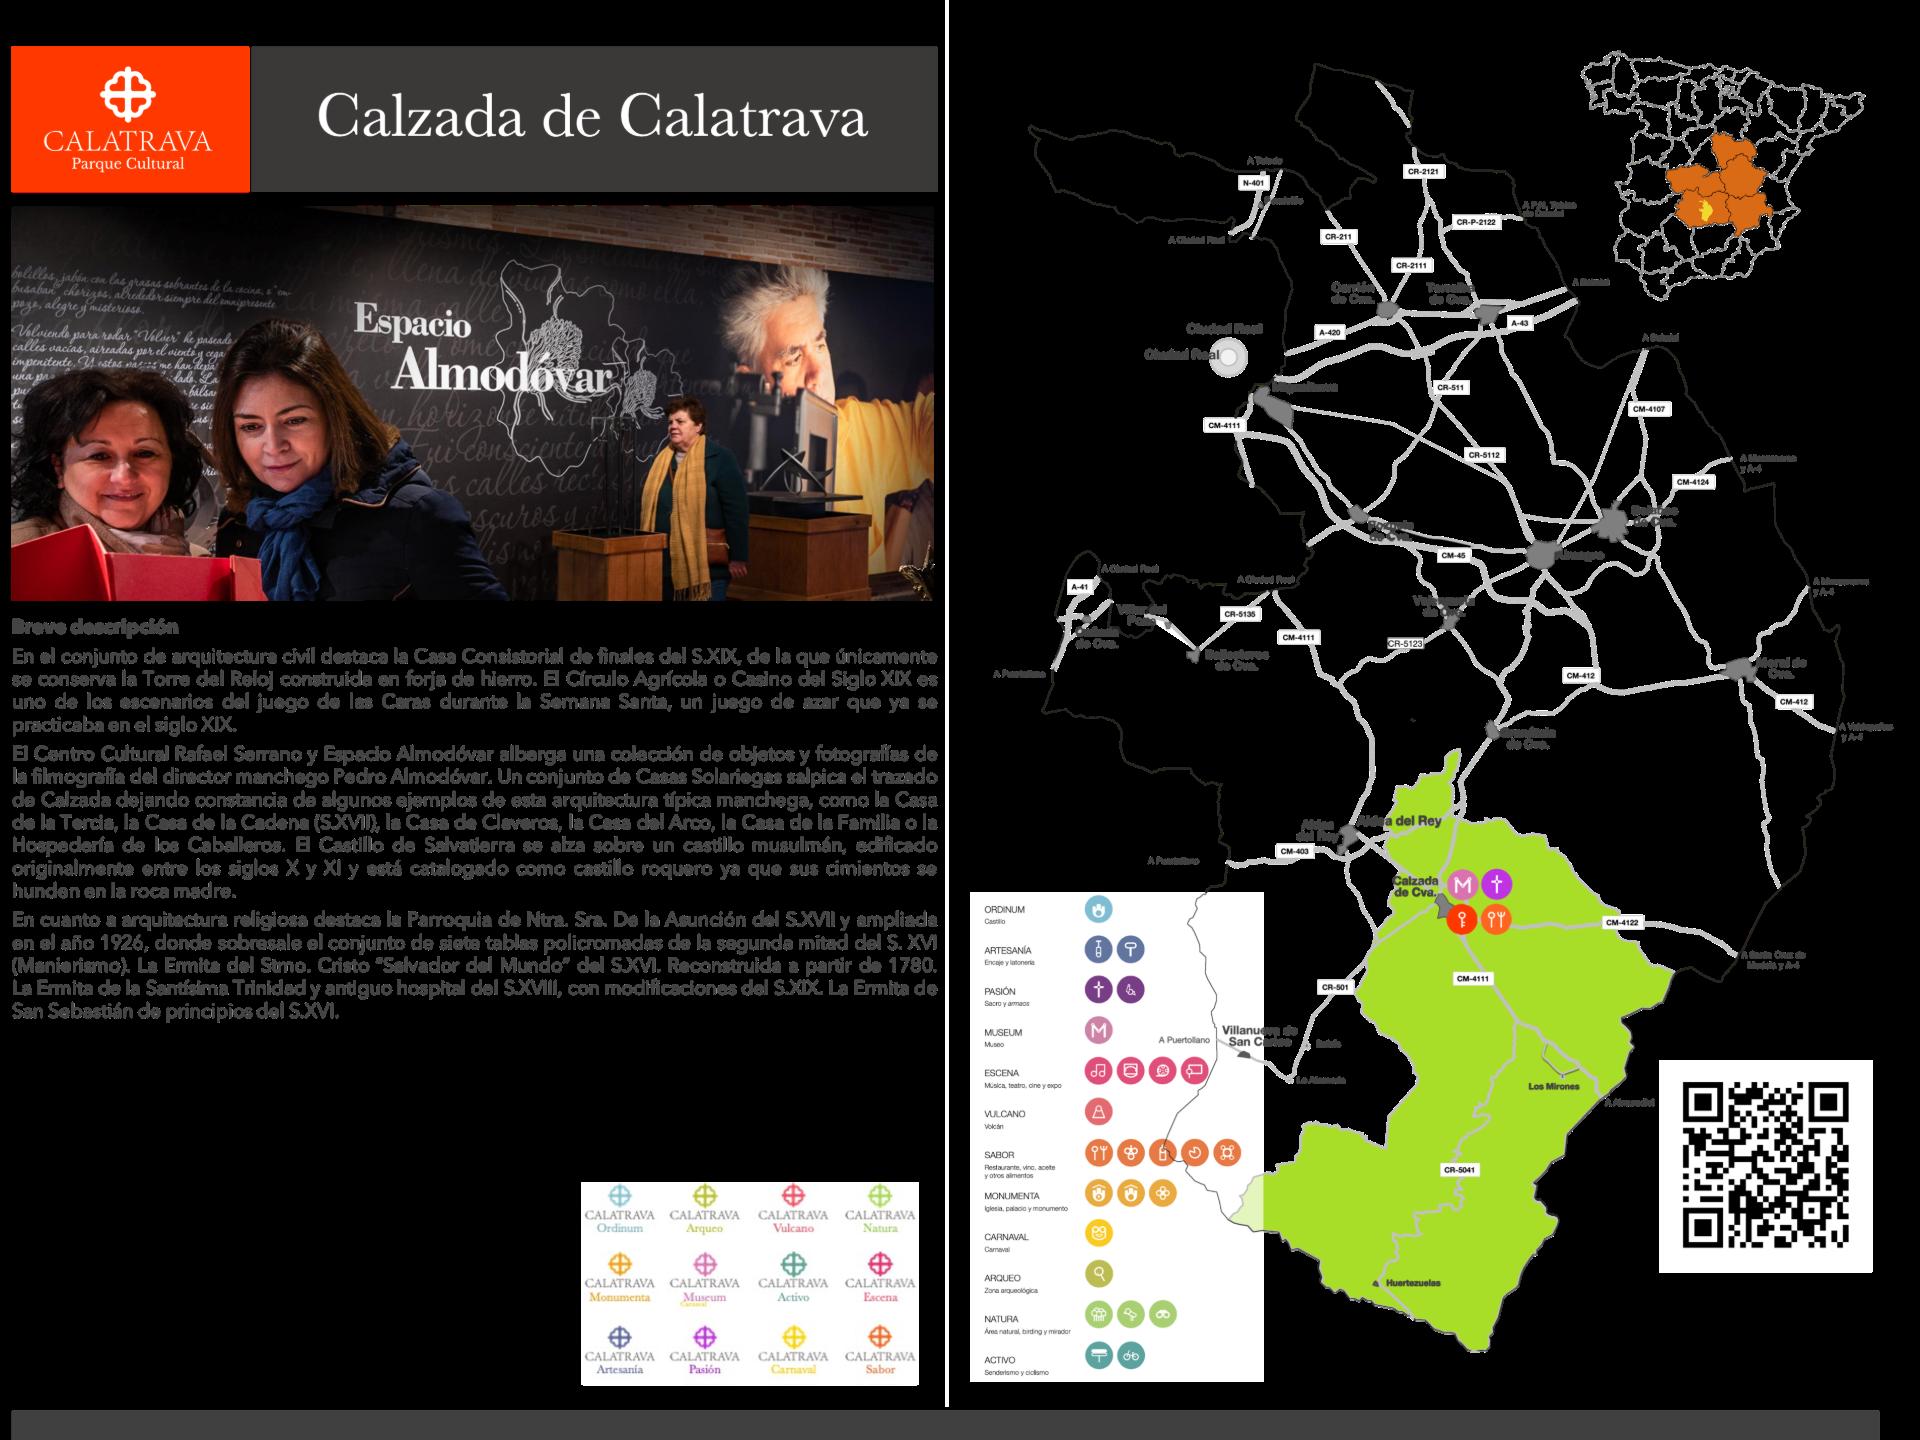 mapa-Calzada de Calatrava